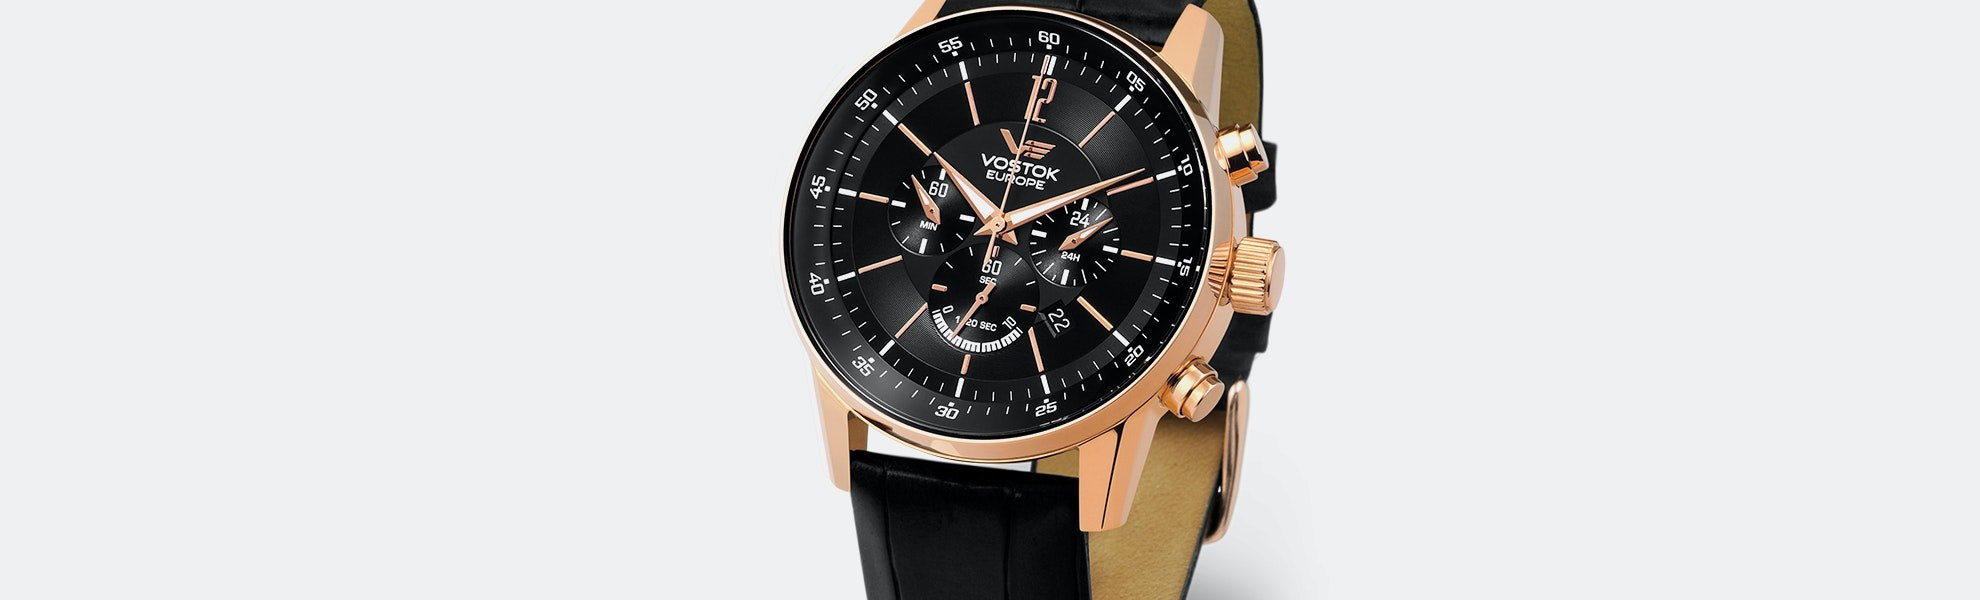 Vostok-Europe GAZ 14 Limo Quartz Chronograph Watch